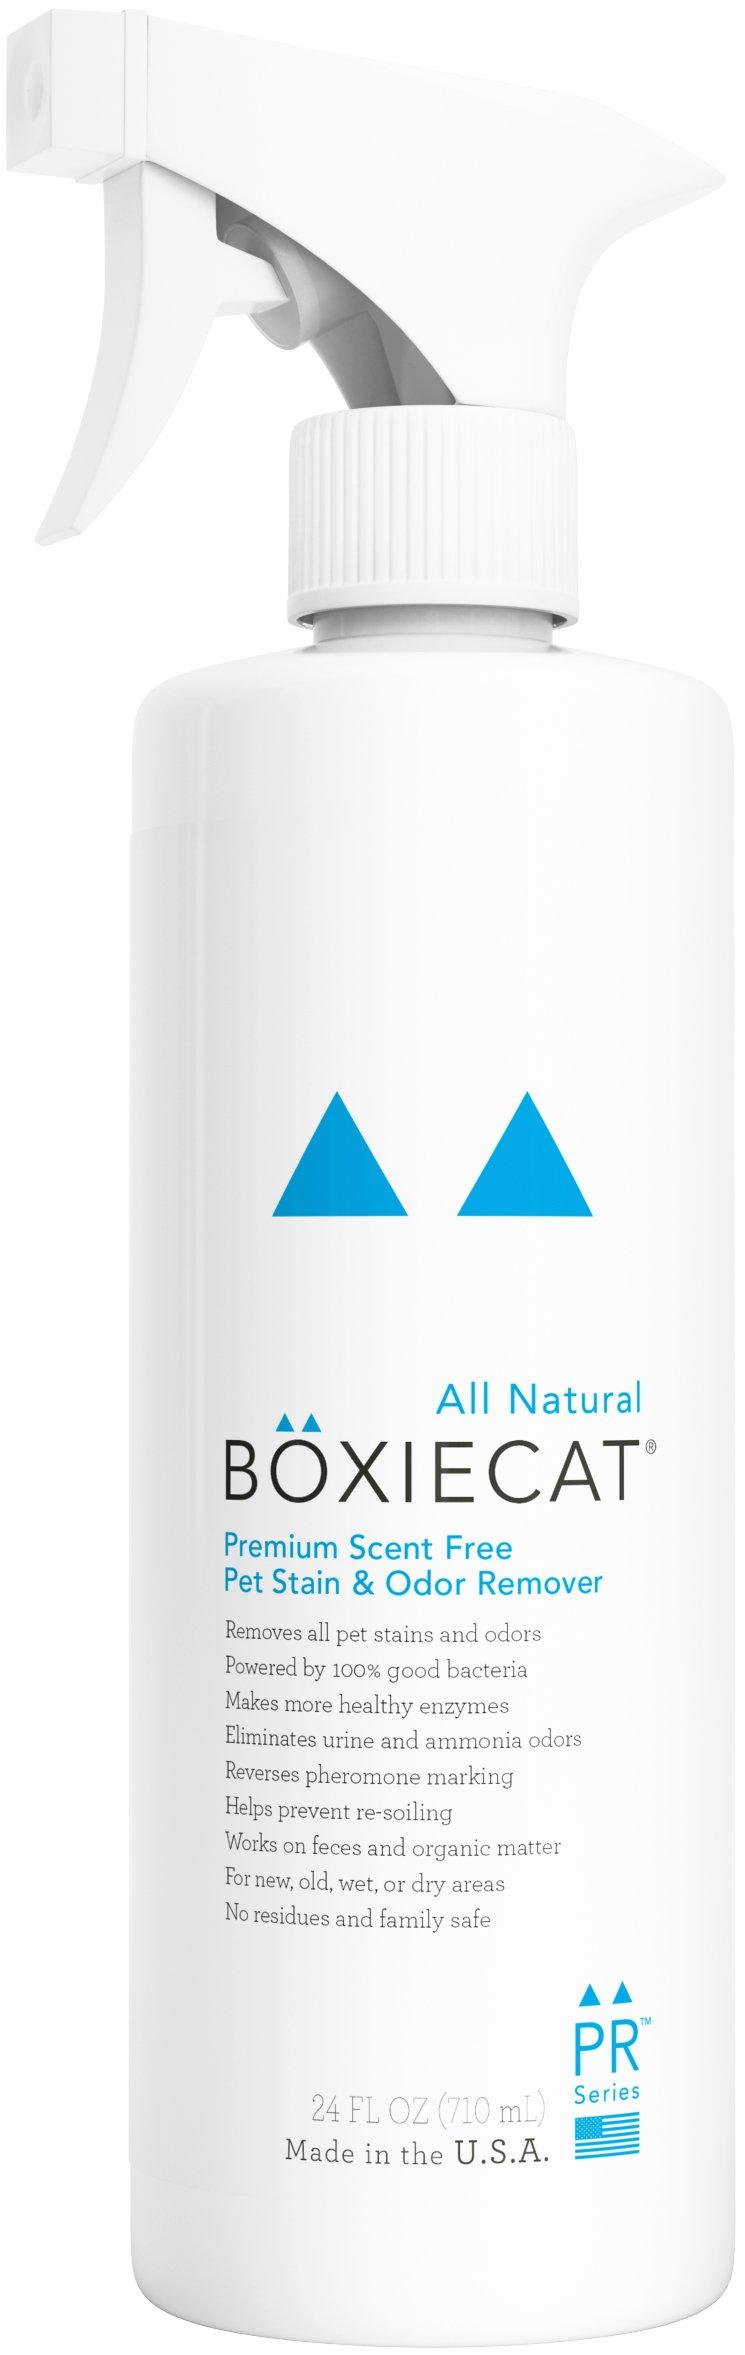 Boxiecat Premium Scent Free Stain & Odor Remover